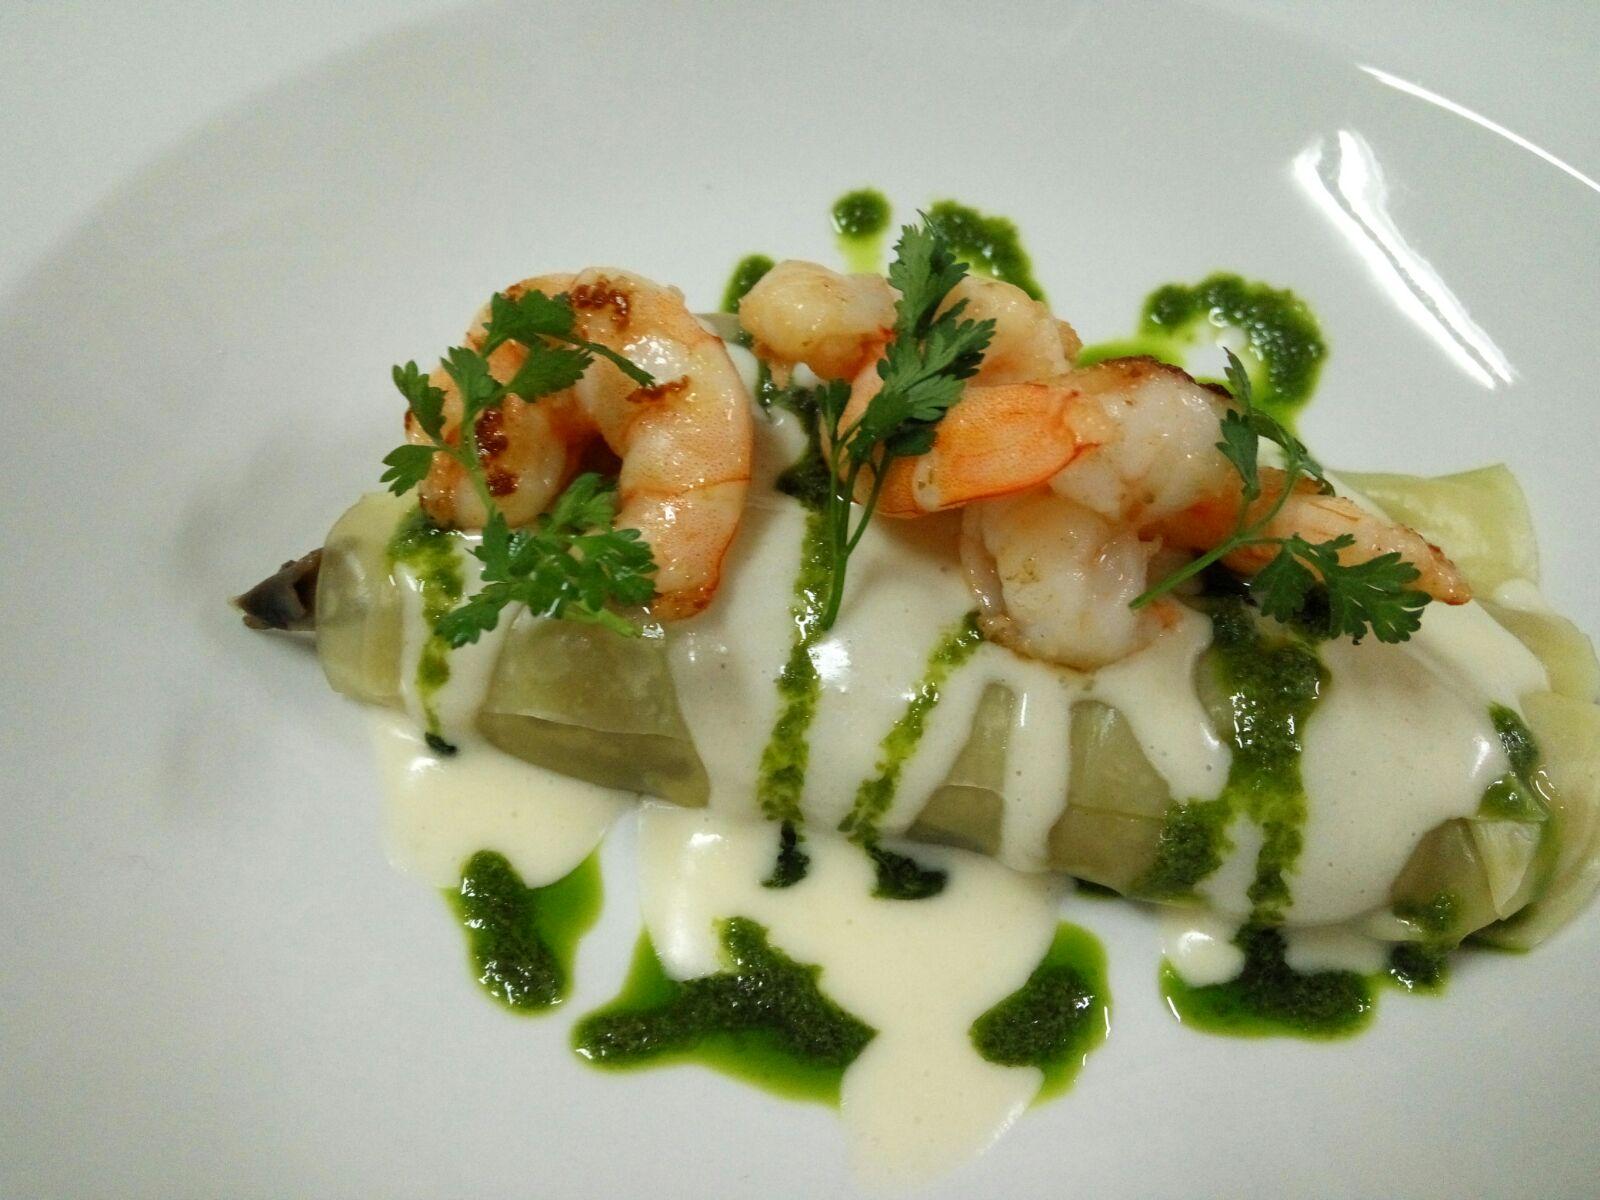 Langostinos Sauté con canelones rellenos de verdura con bacalao y salsa de queso Manchego